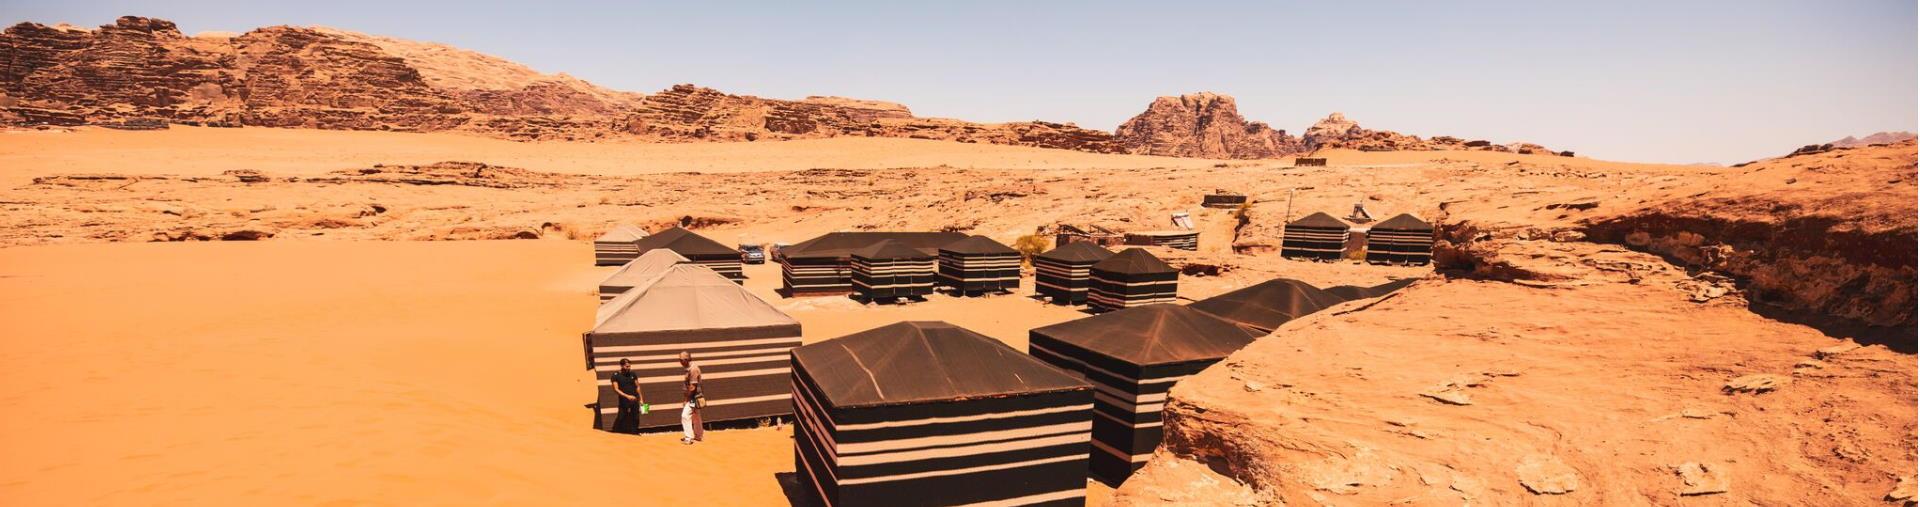 Traditional Bedouin campsite